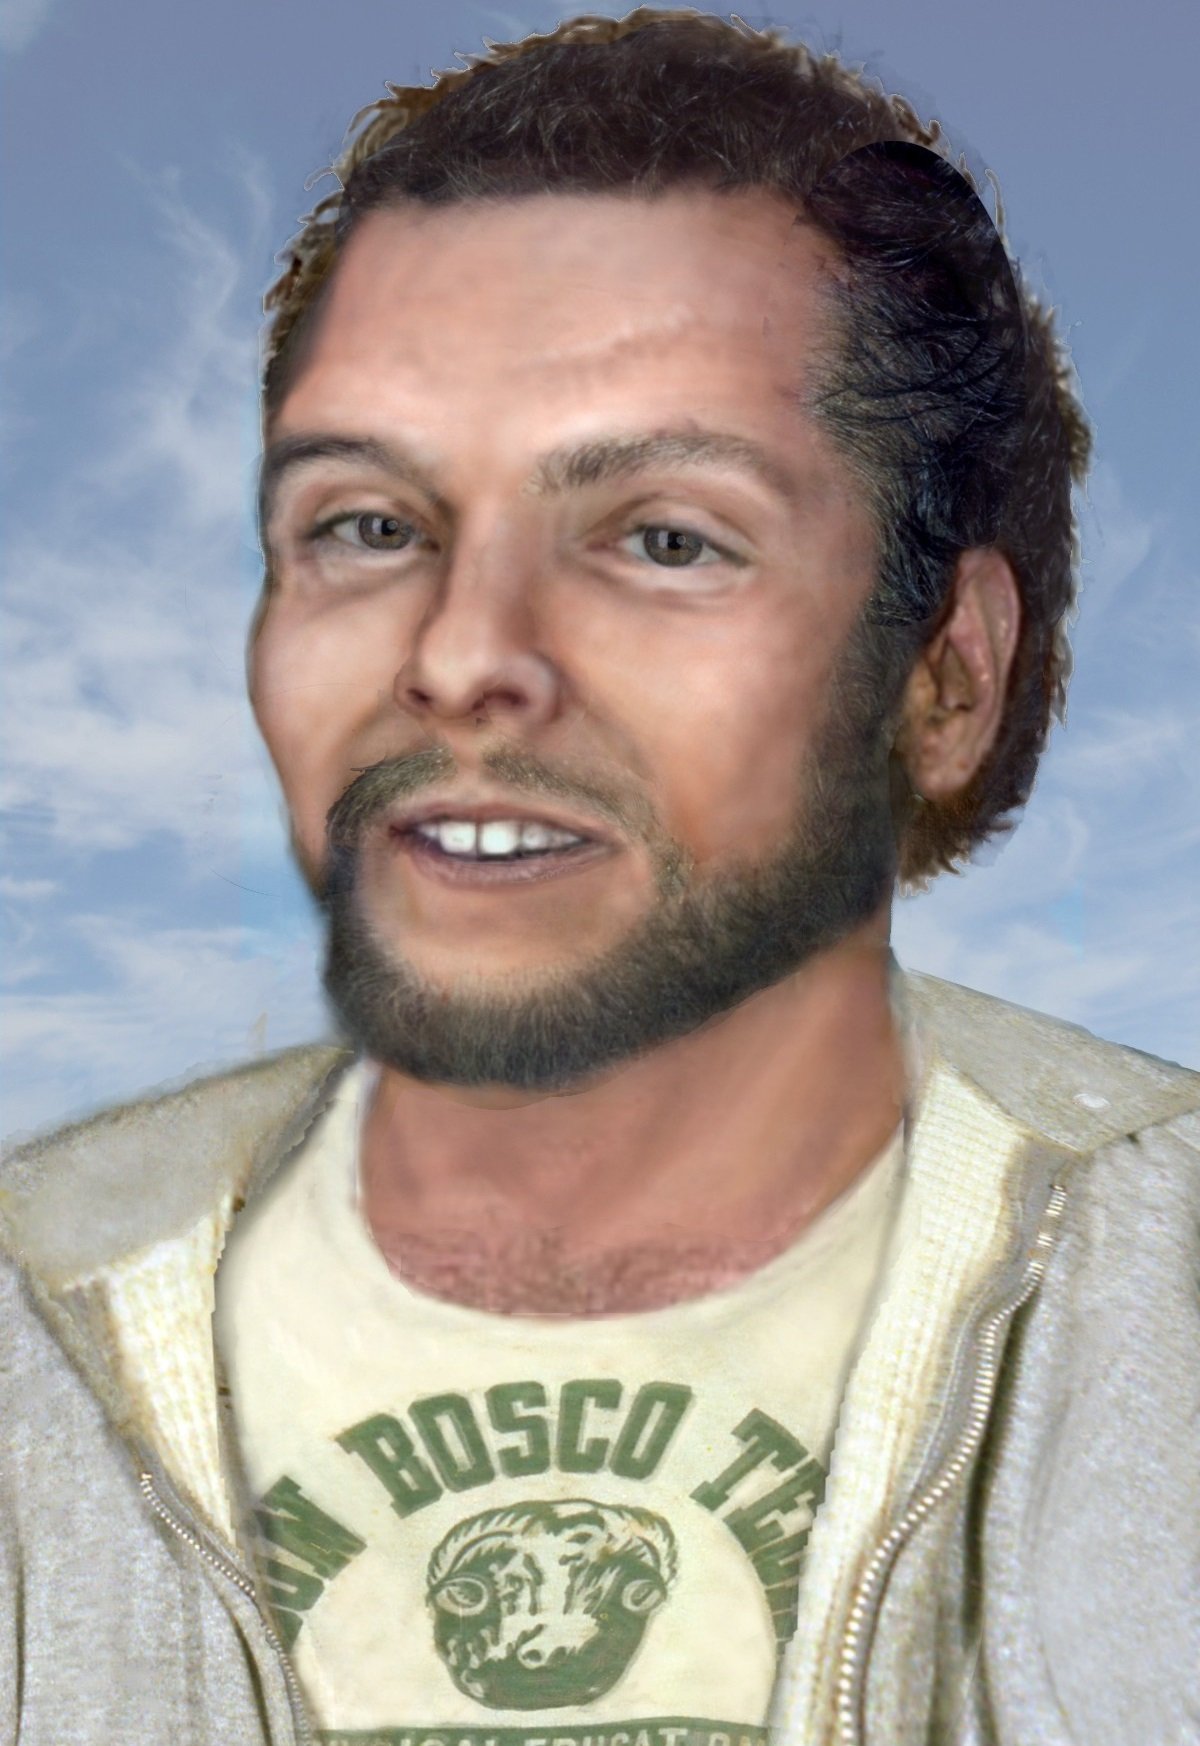 Cuyahoga County John Doe (1981)